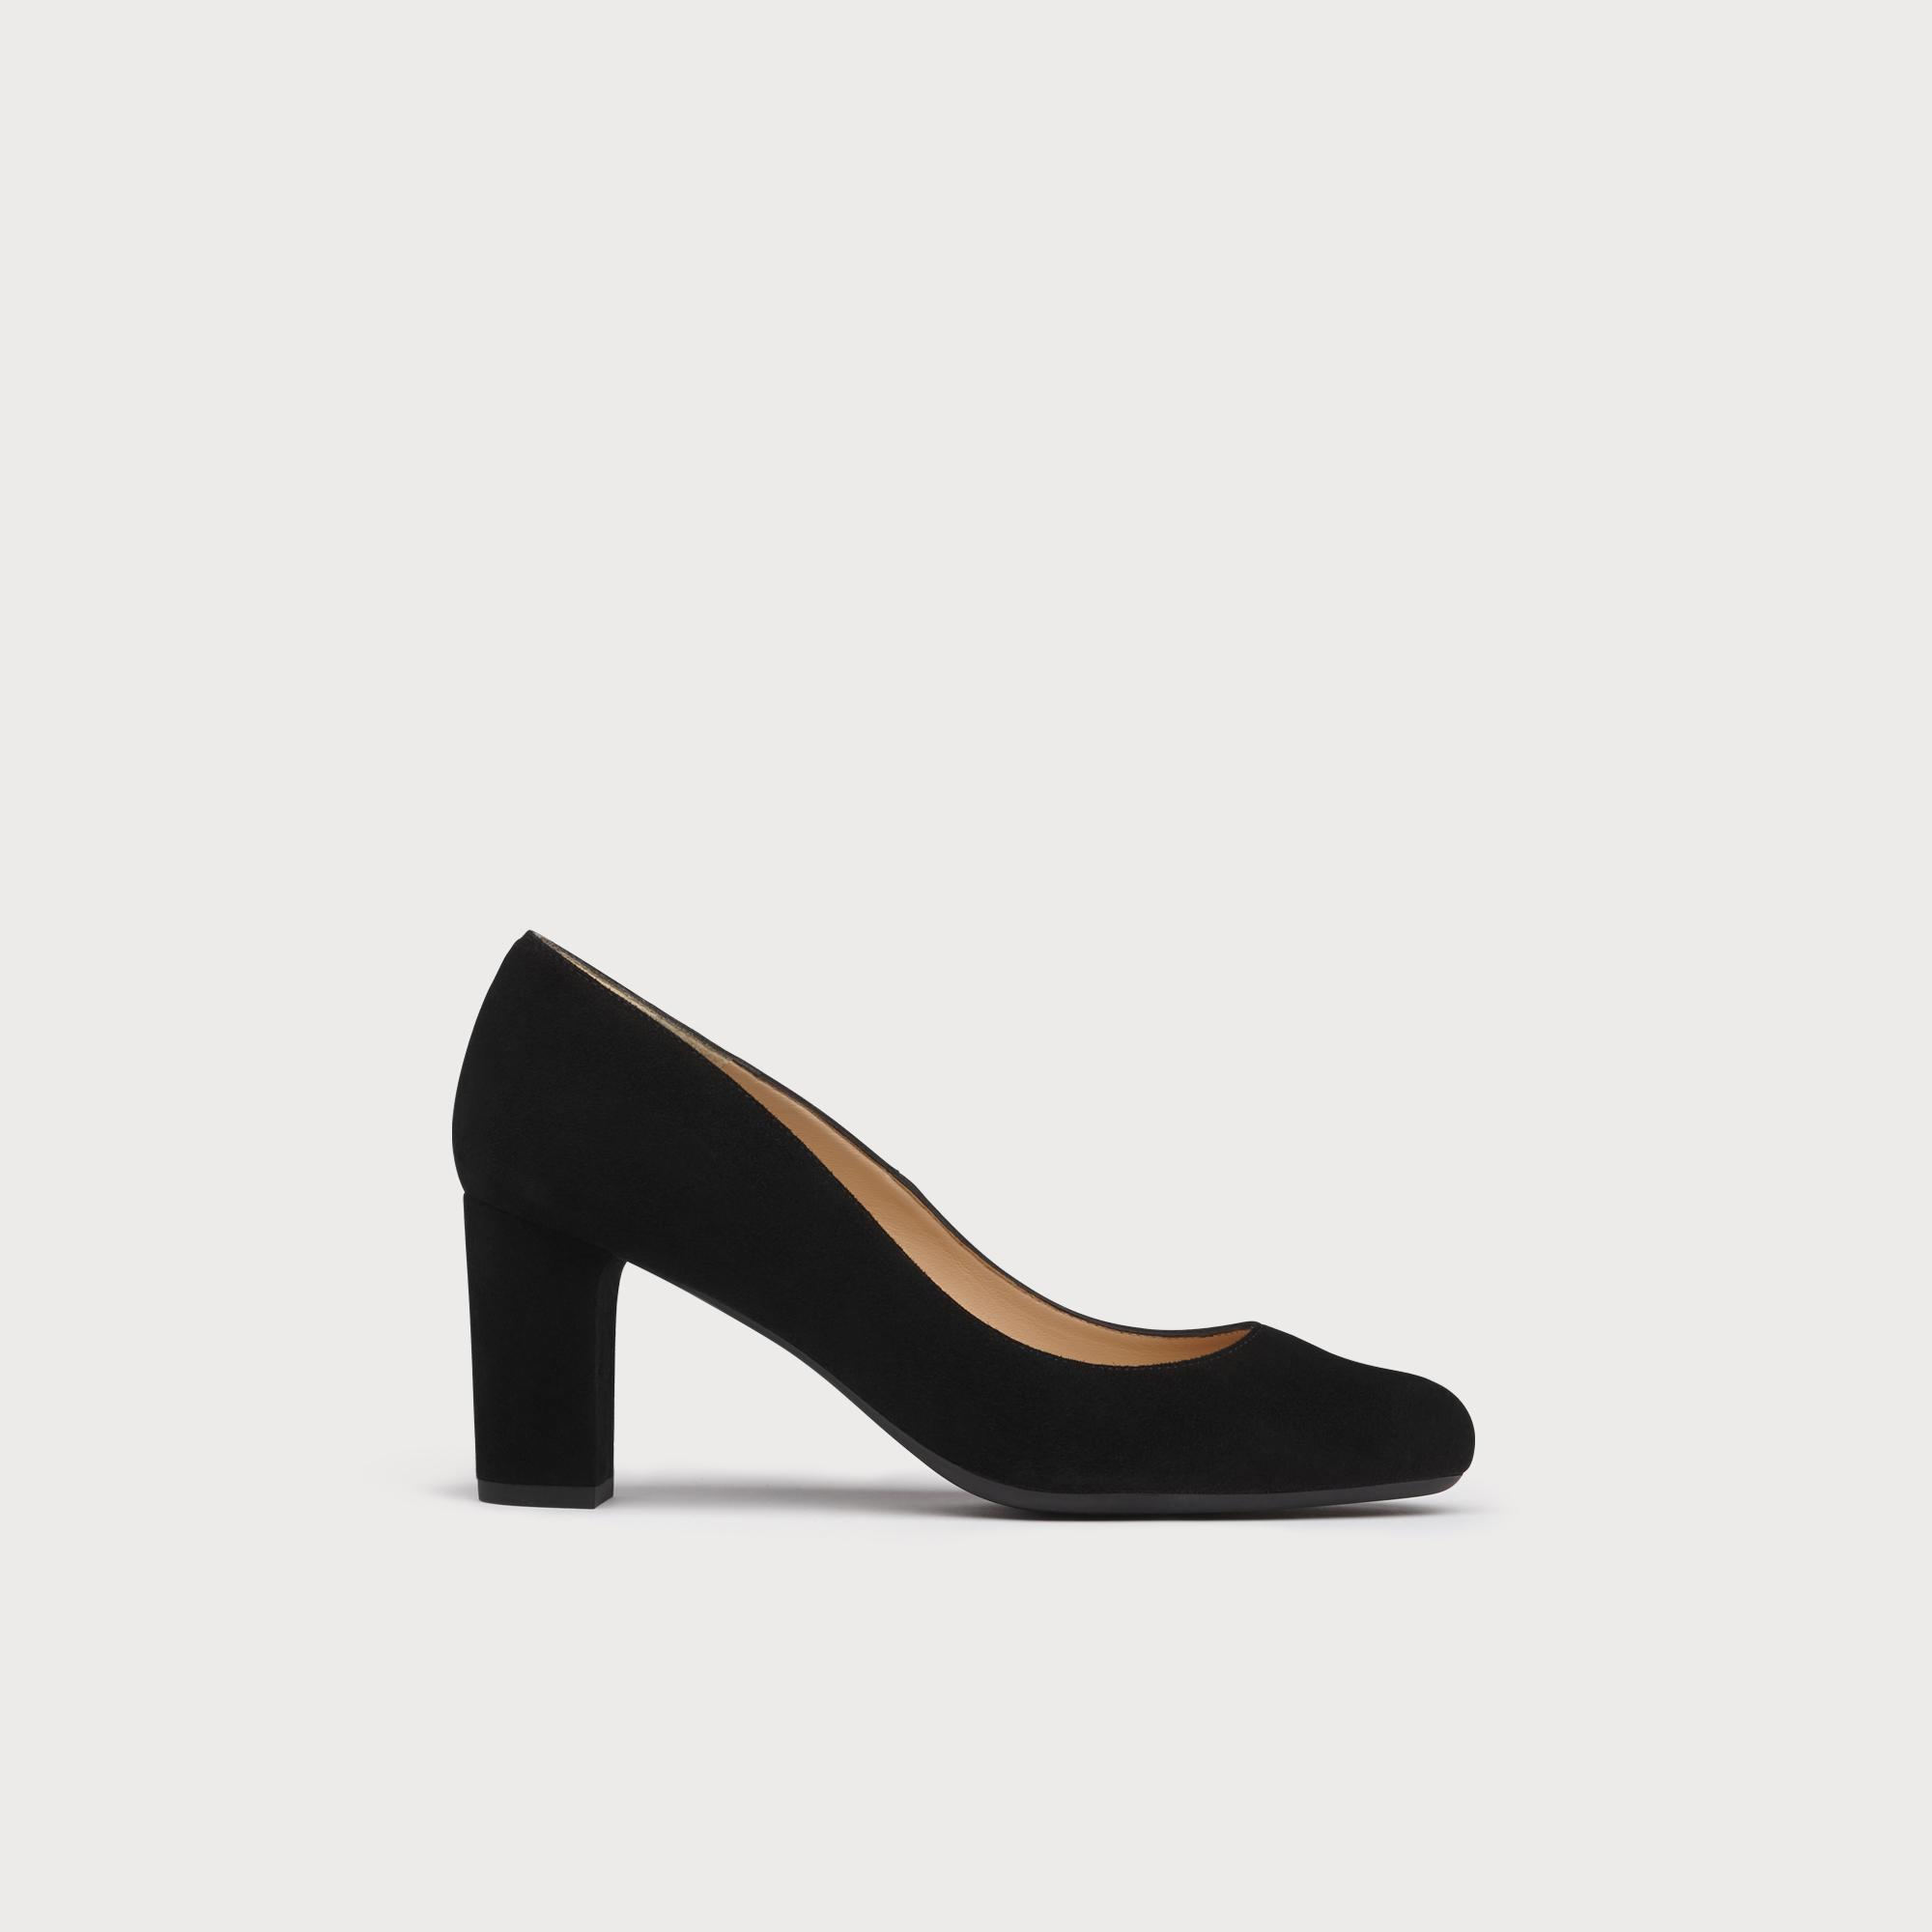 Sersha Black Suede Block Heel